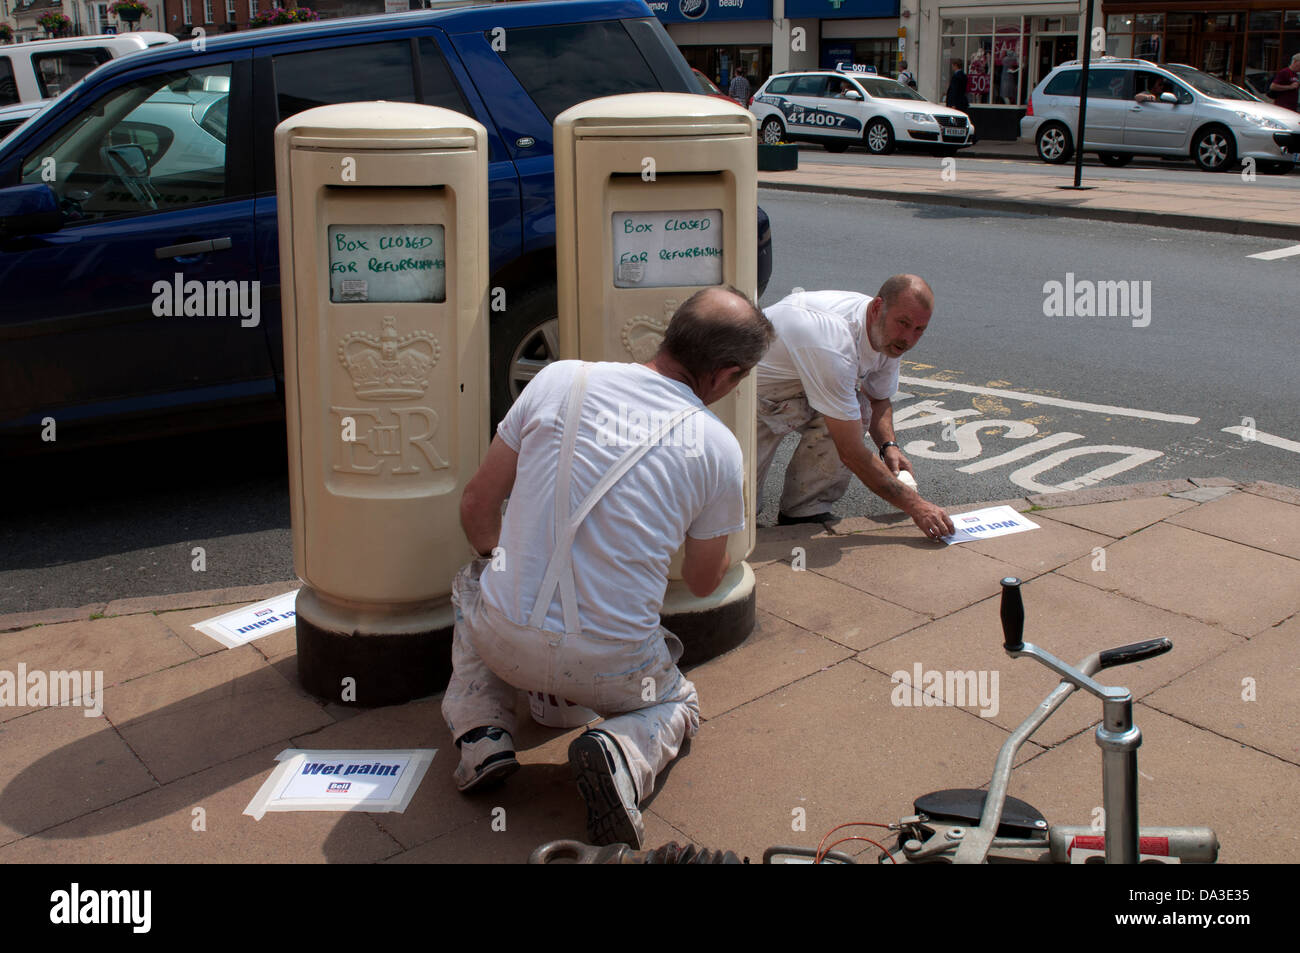 Repainting gold postboxes, Stratford-upon-Avon, UK - Stock Image